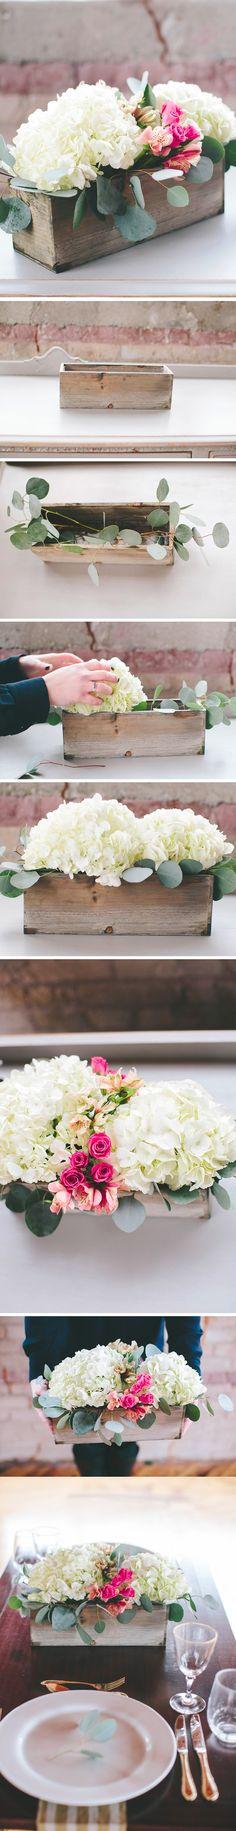 DIY: Centros de mesa con hortensias naturales / http://apracticalwedding.com/                                                                                                                                                                                 Más